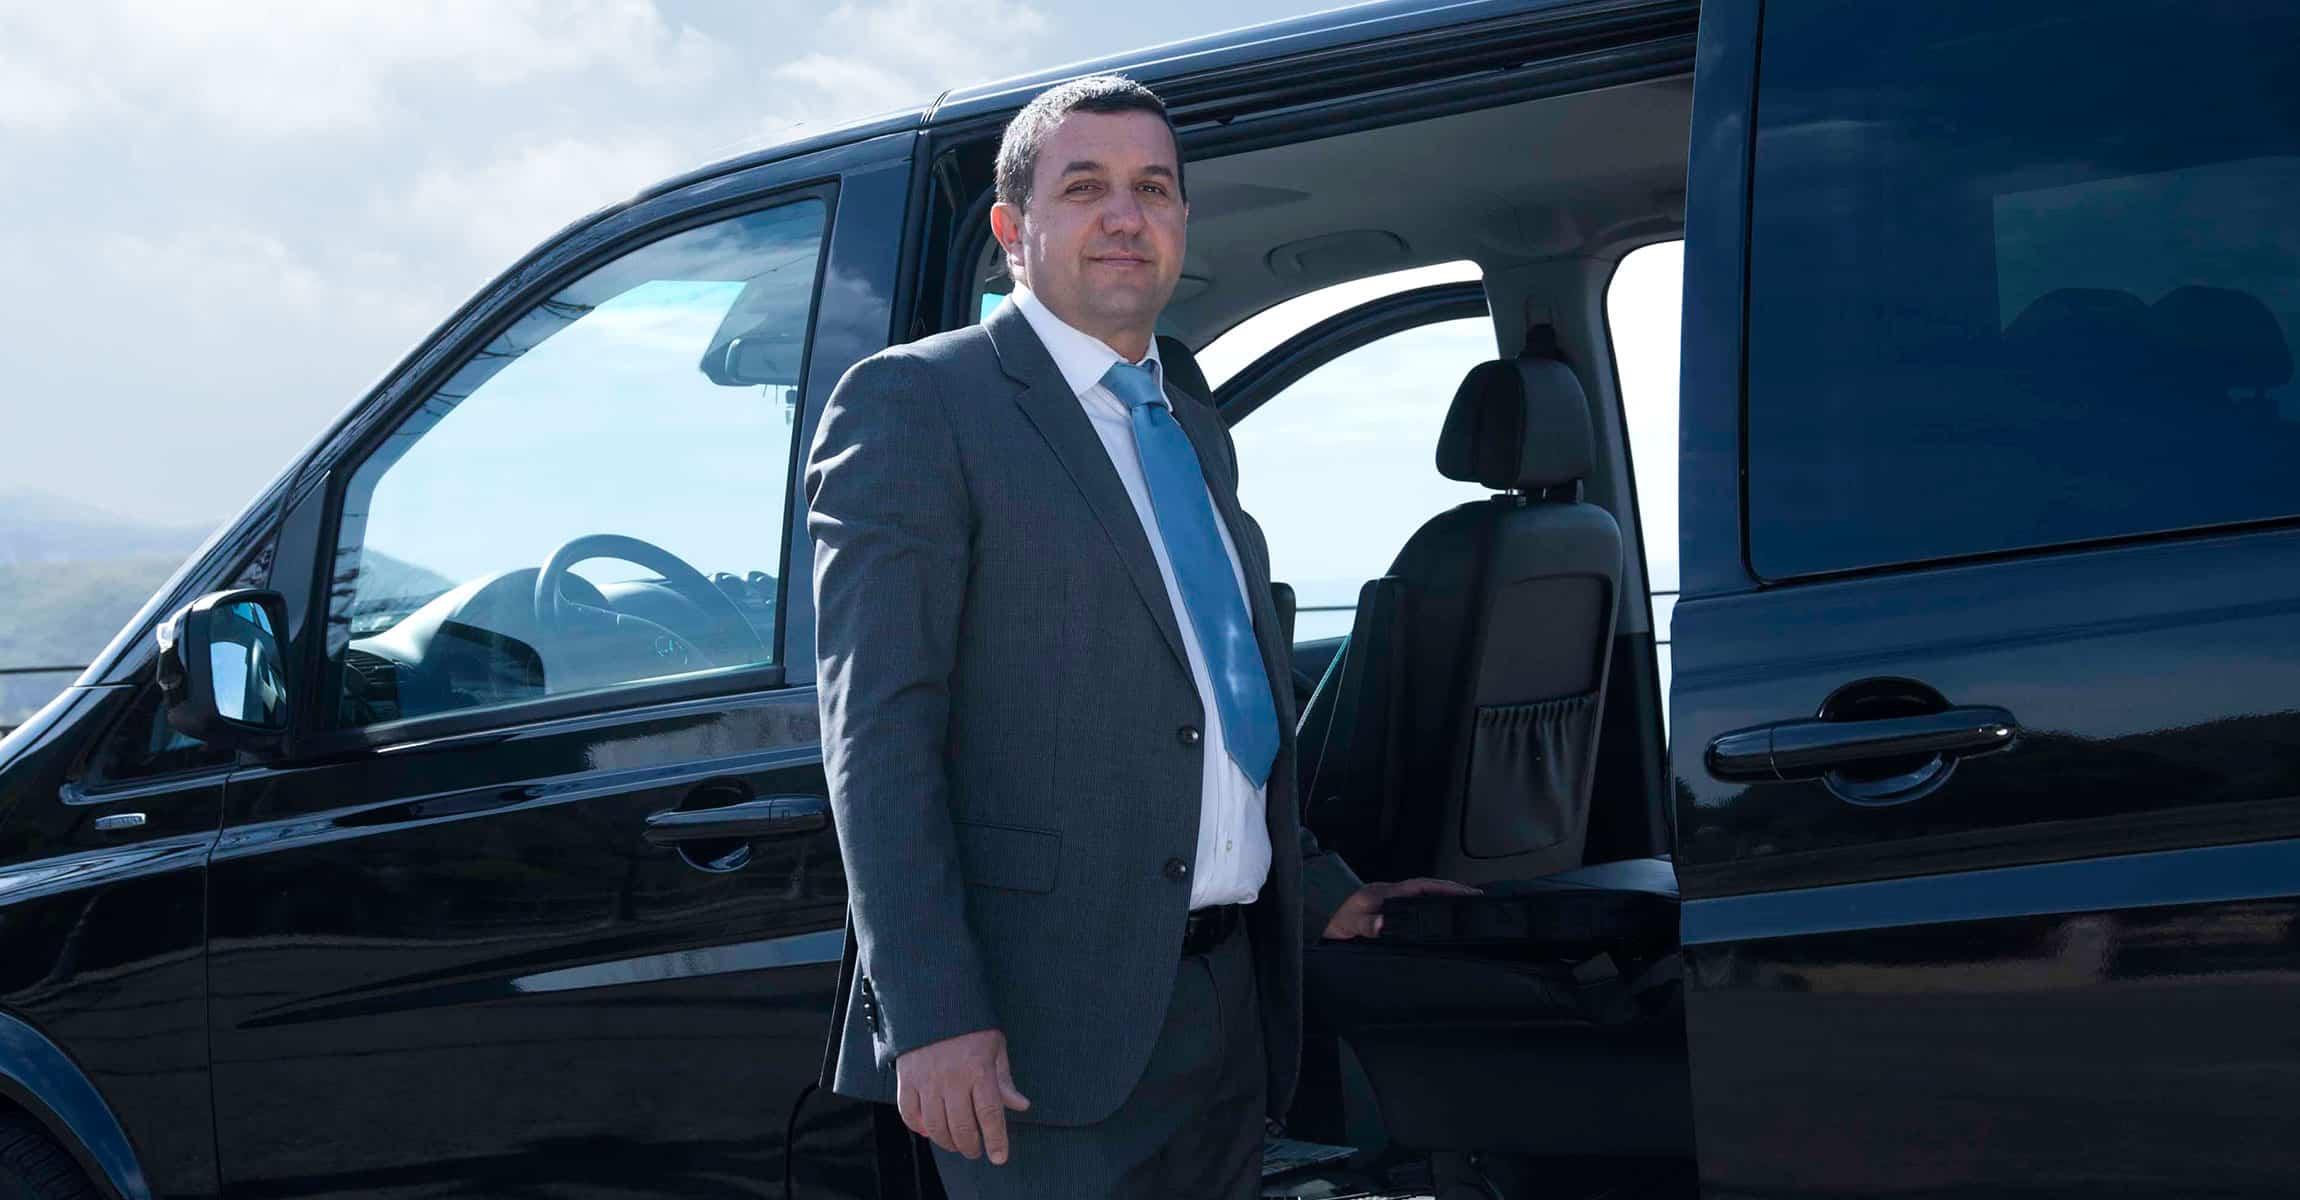 High Quality Taxi Service Italy | Chauffeur driver Rome Naples Gaeta, Formia